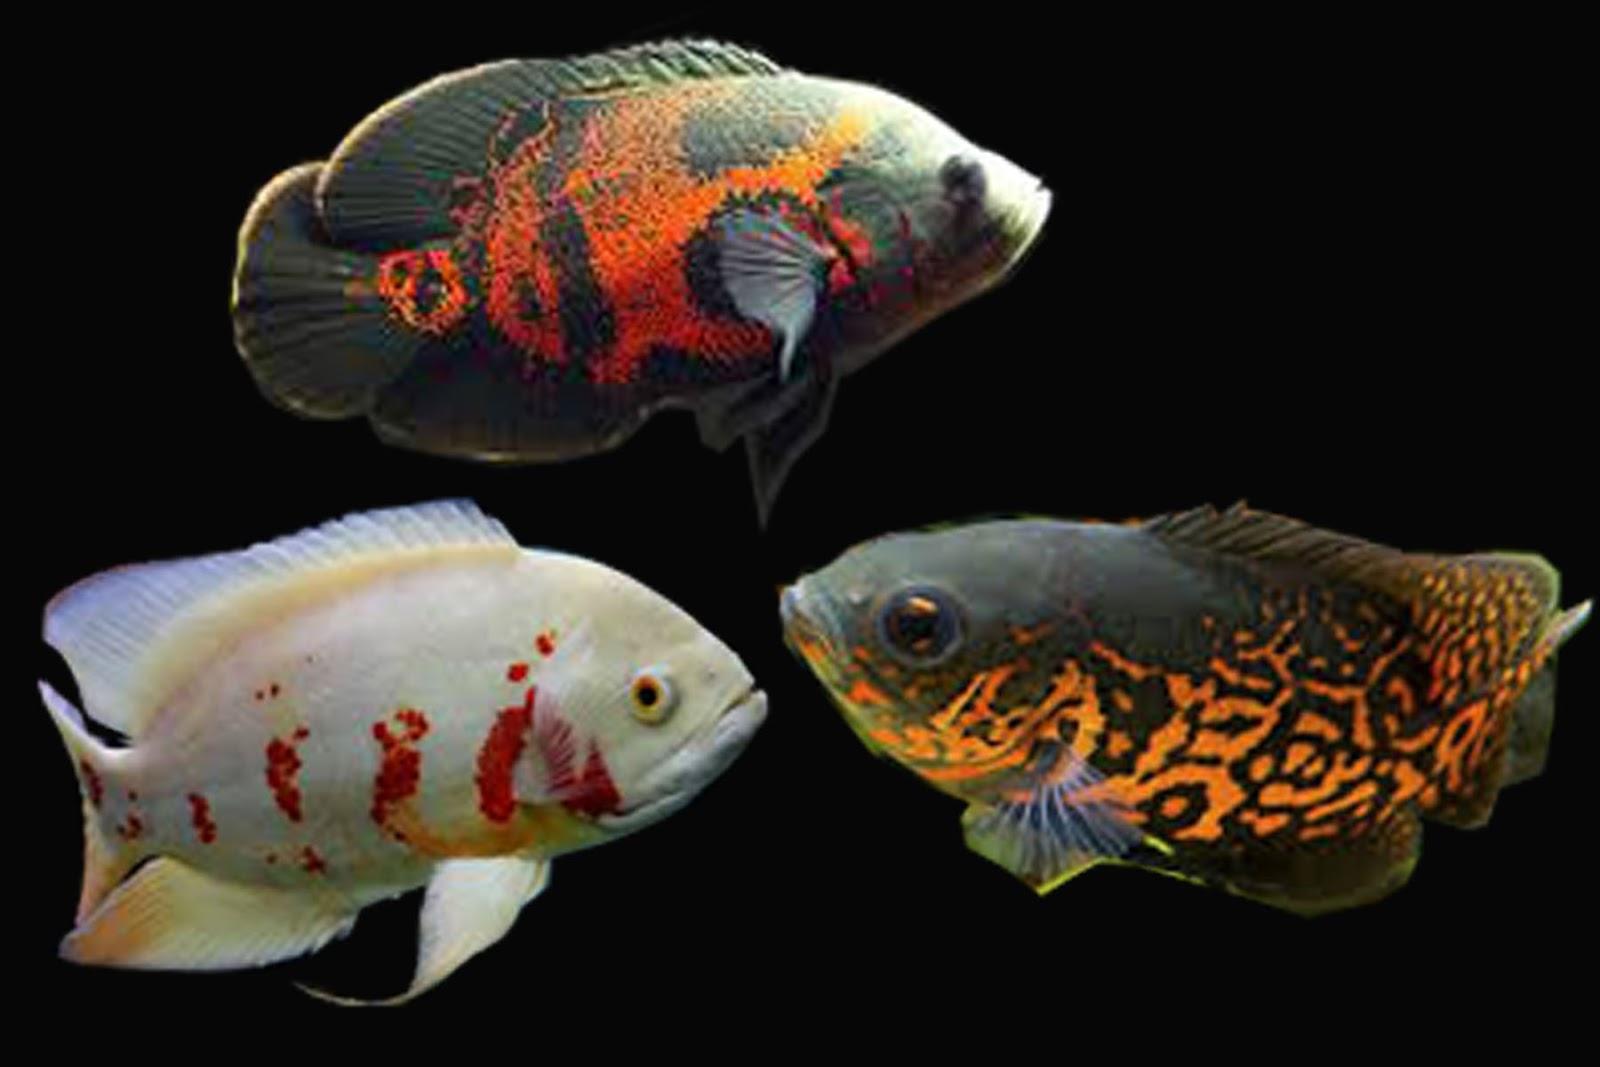 Semua Tentang Ikan Hias Air Tawar Serba Serbi Ikan Hias Oscar